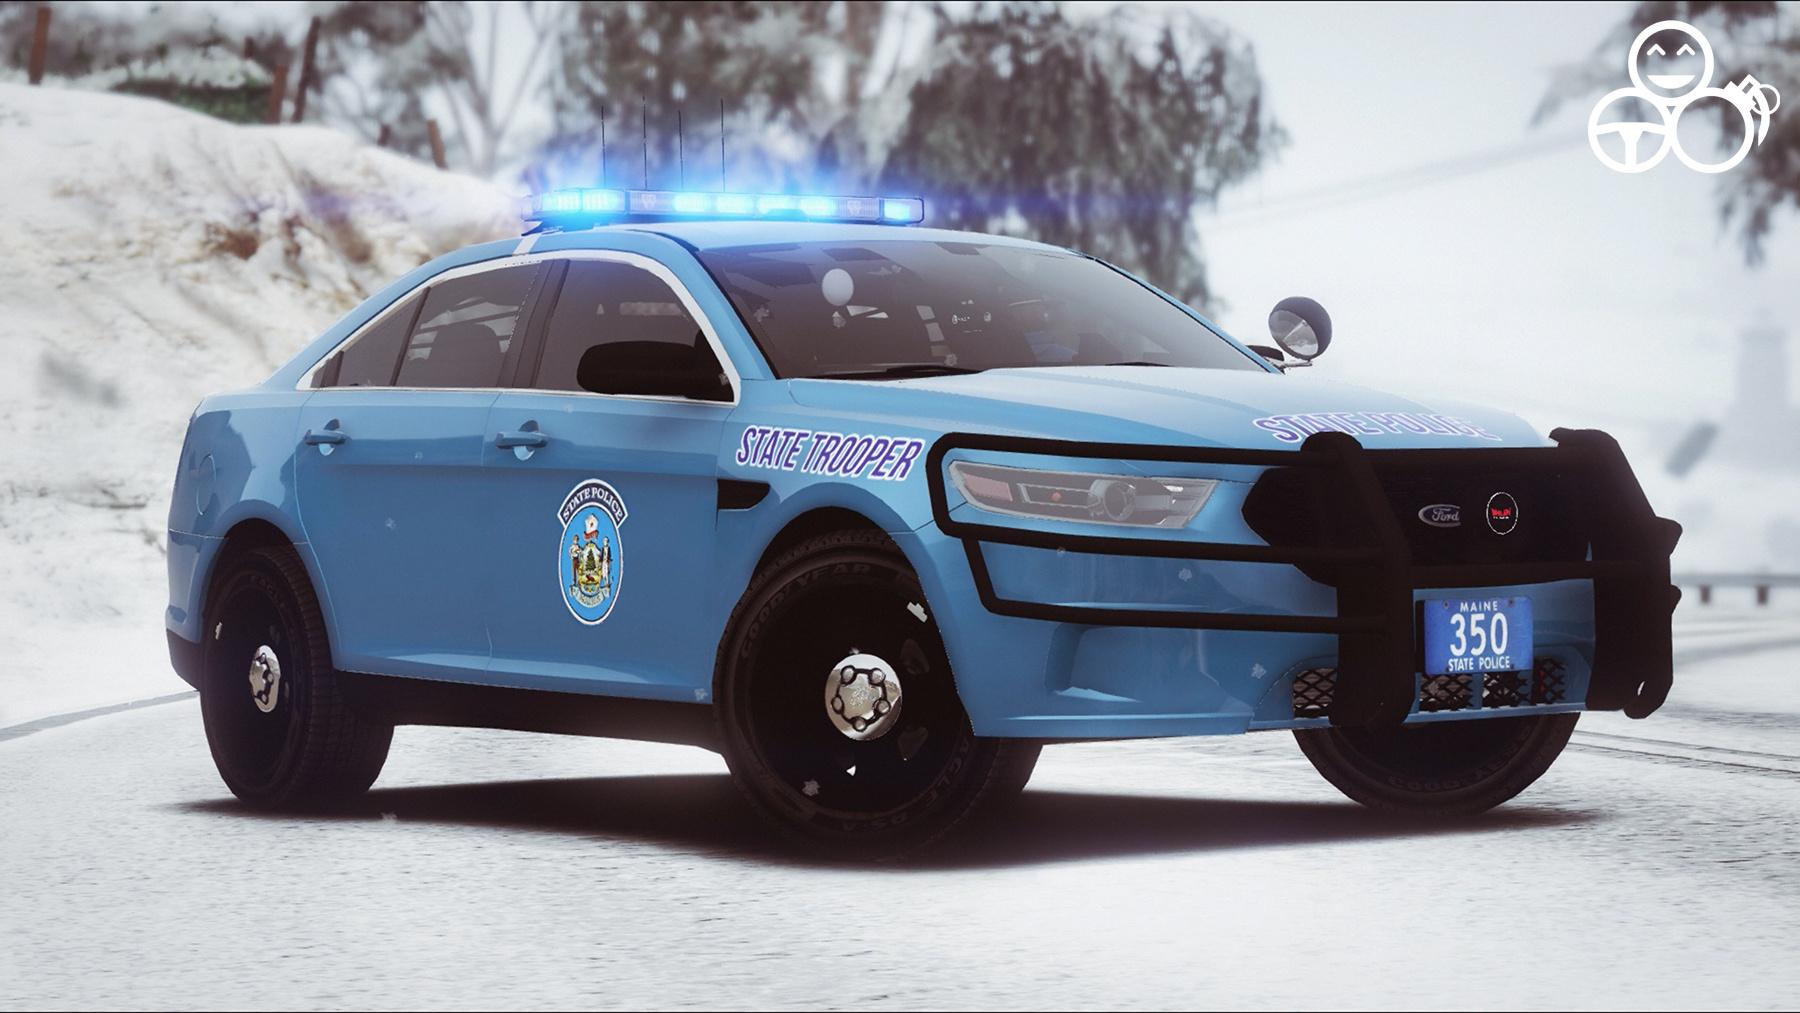 Maine State Police - Taurus and Ped Skin - GTA5-Mods.com